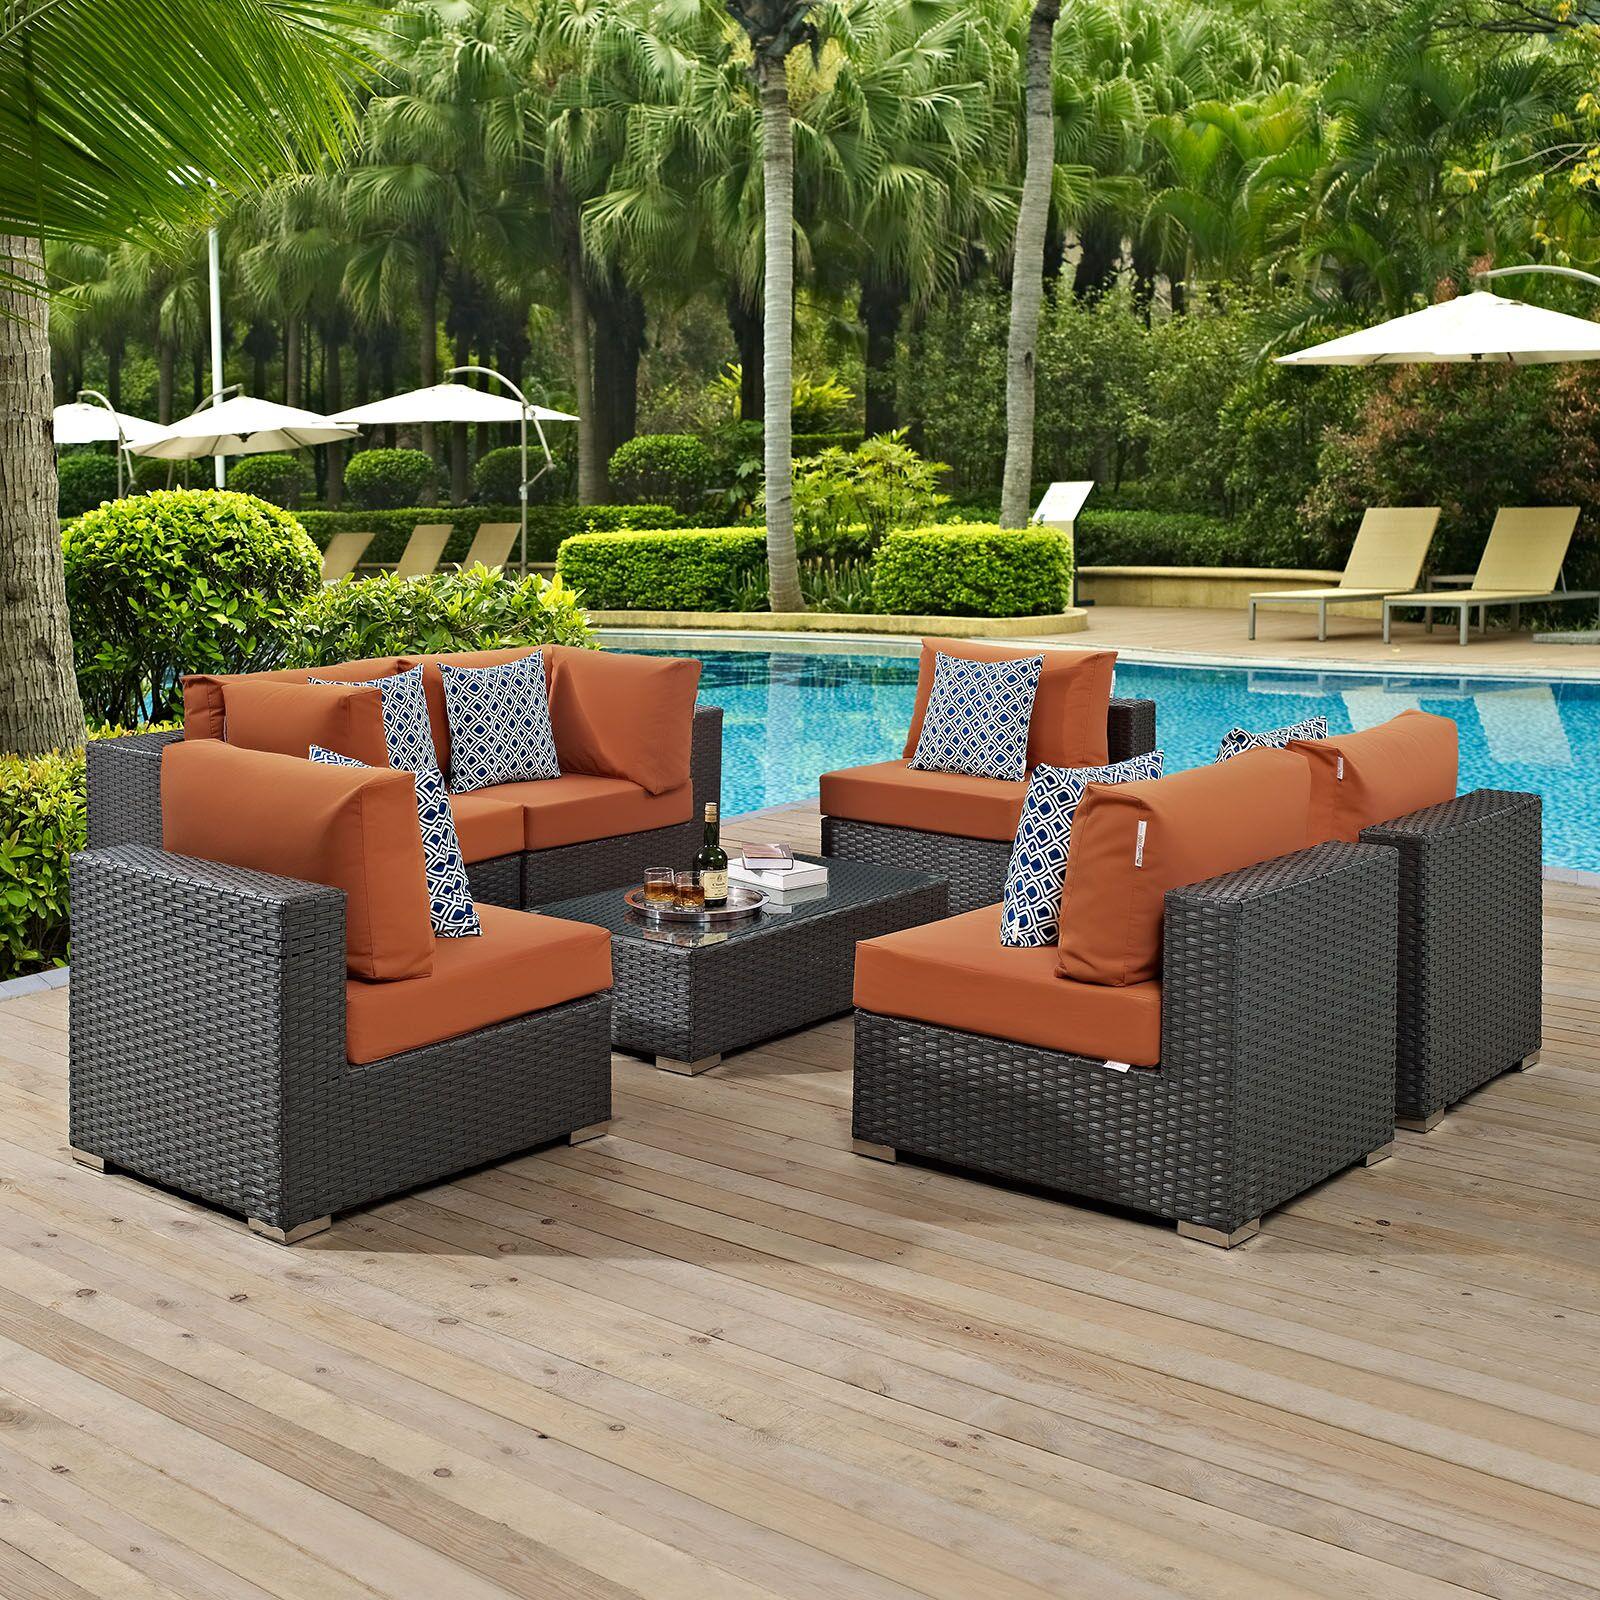 Tripp 7 Piece Rattan Sunbrella Sectional Set with Cushions Fabric: Beige